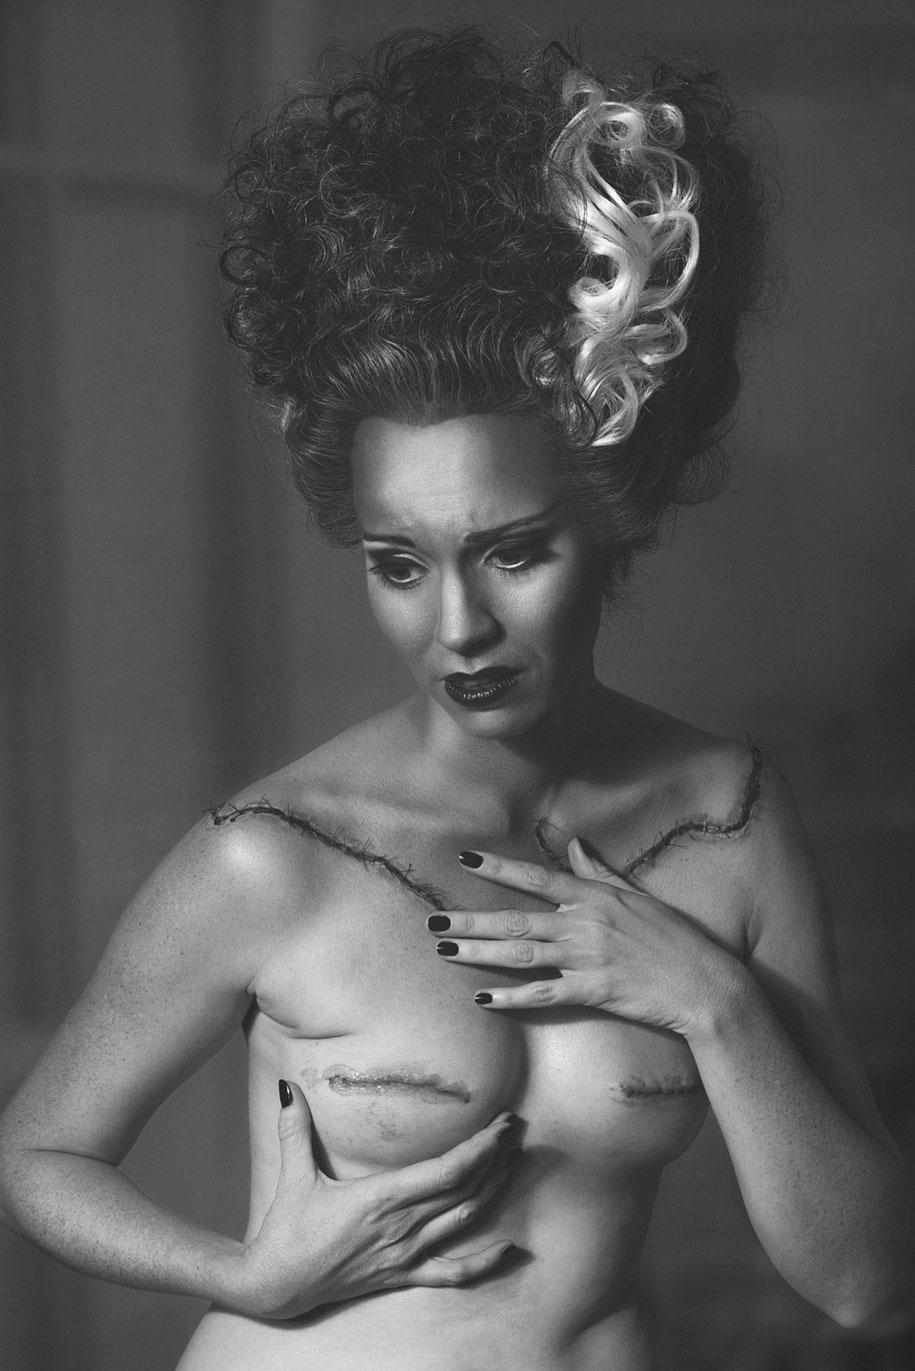 cancer-mastectomy-photo-series-my-breast-choice-aniela-mcguinness-2